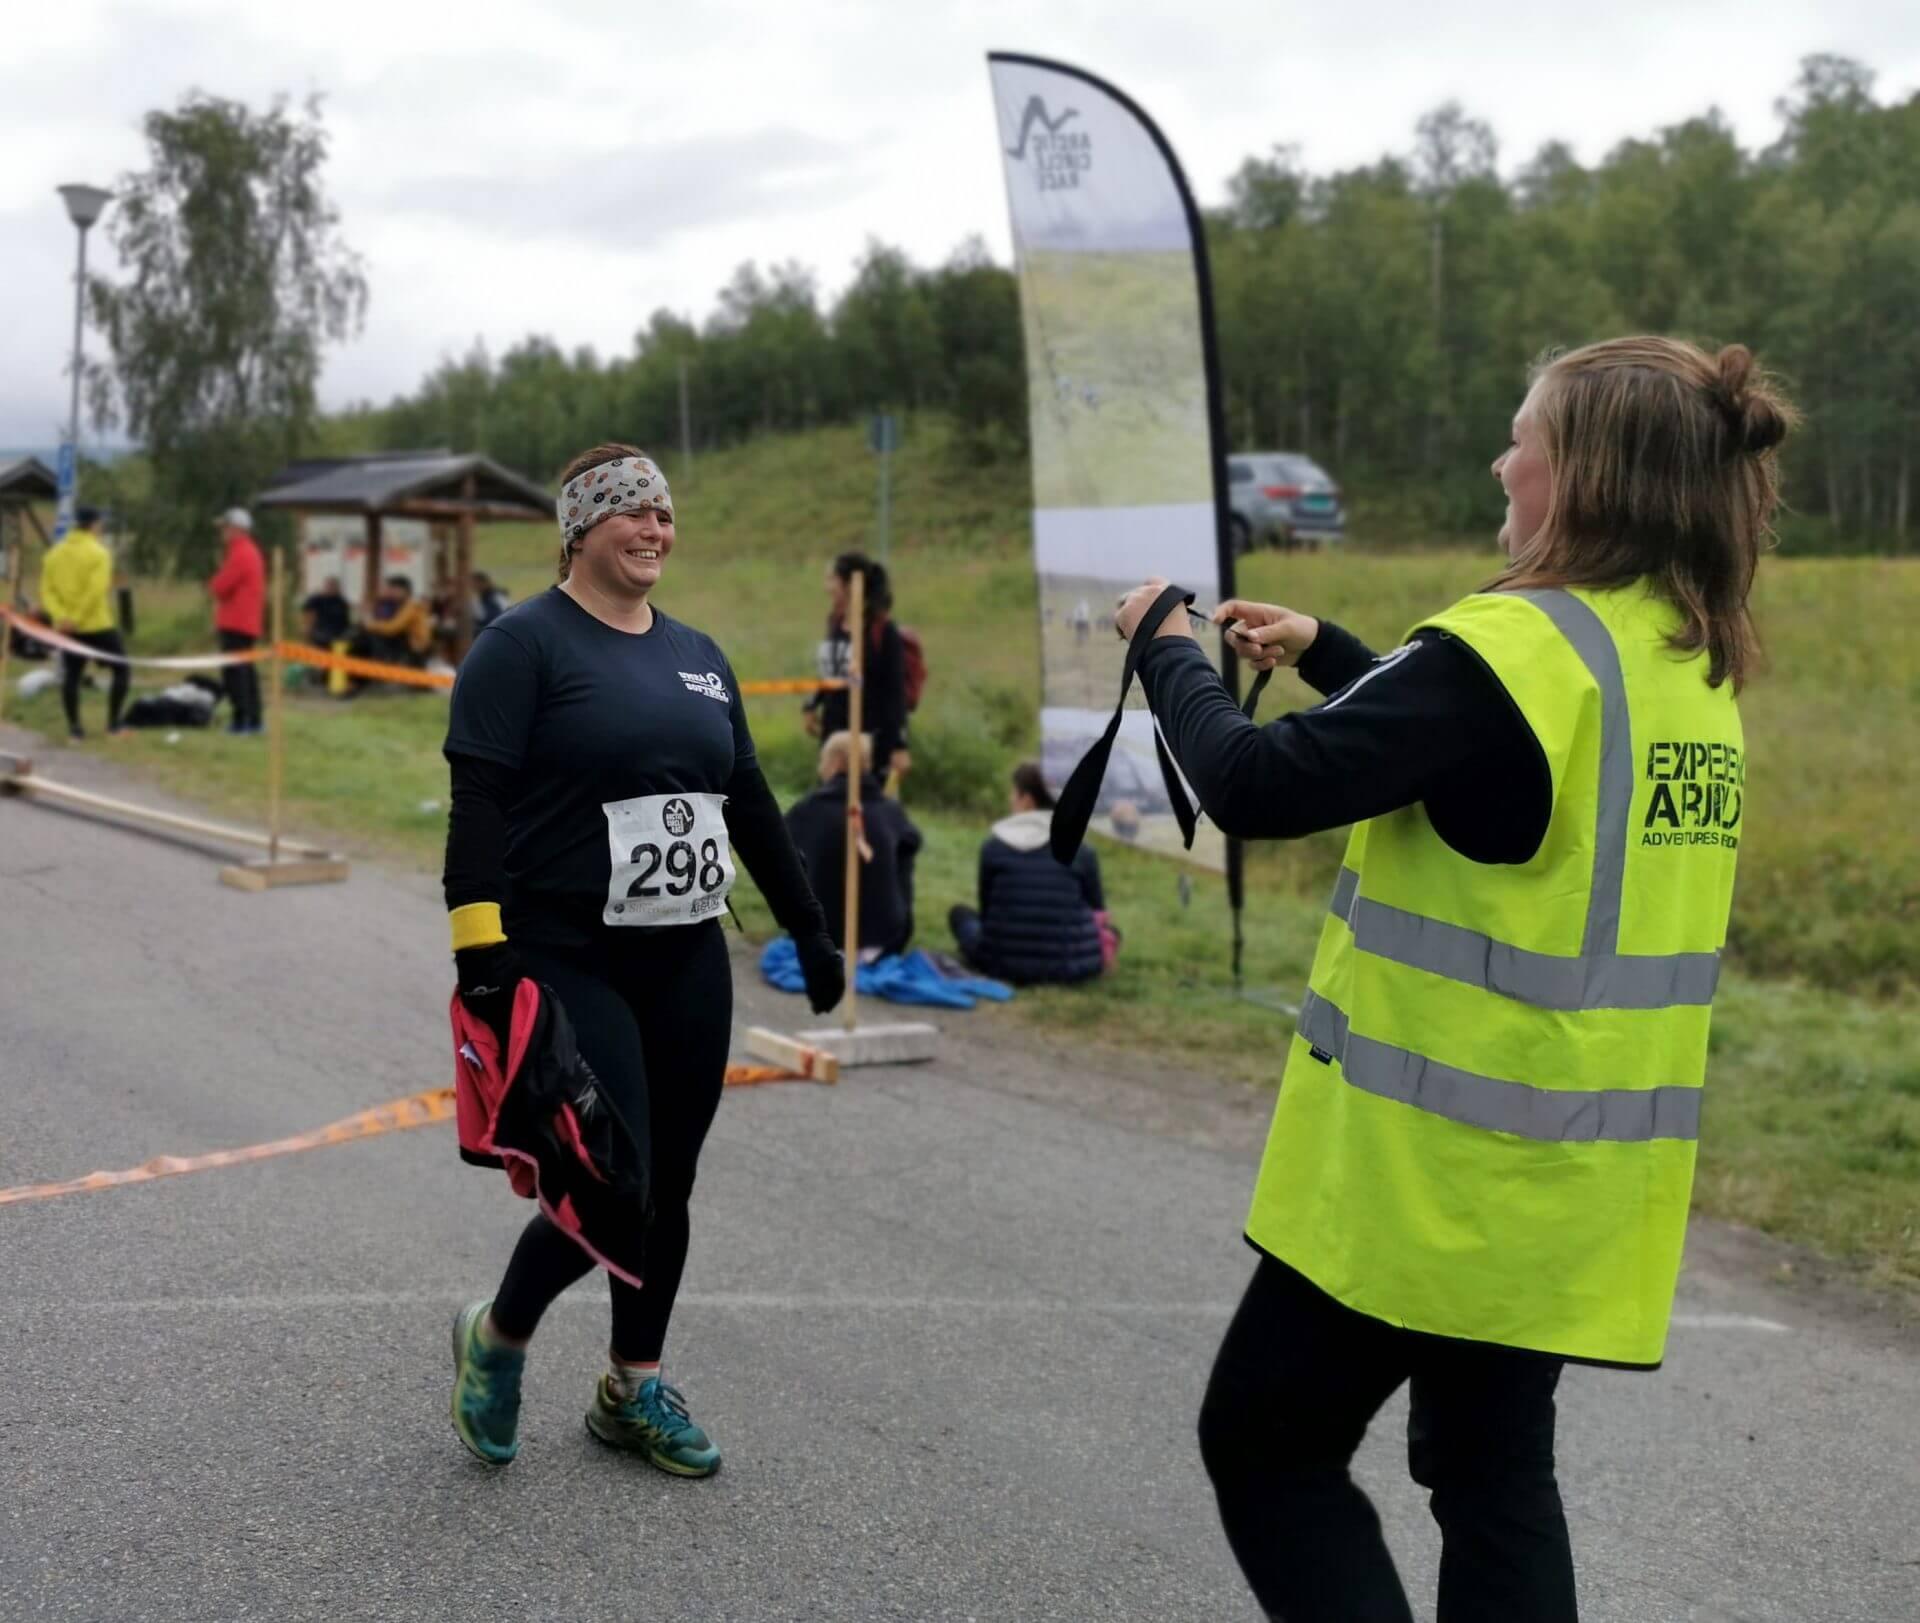 Arctic Circle Race 2019 Polcirkelloppet Guijaure nr 298 mål